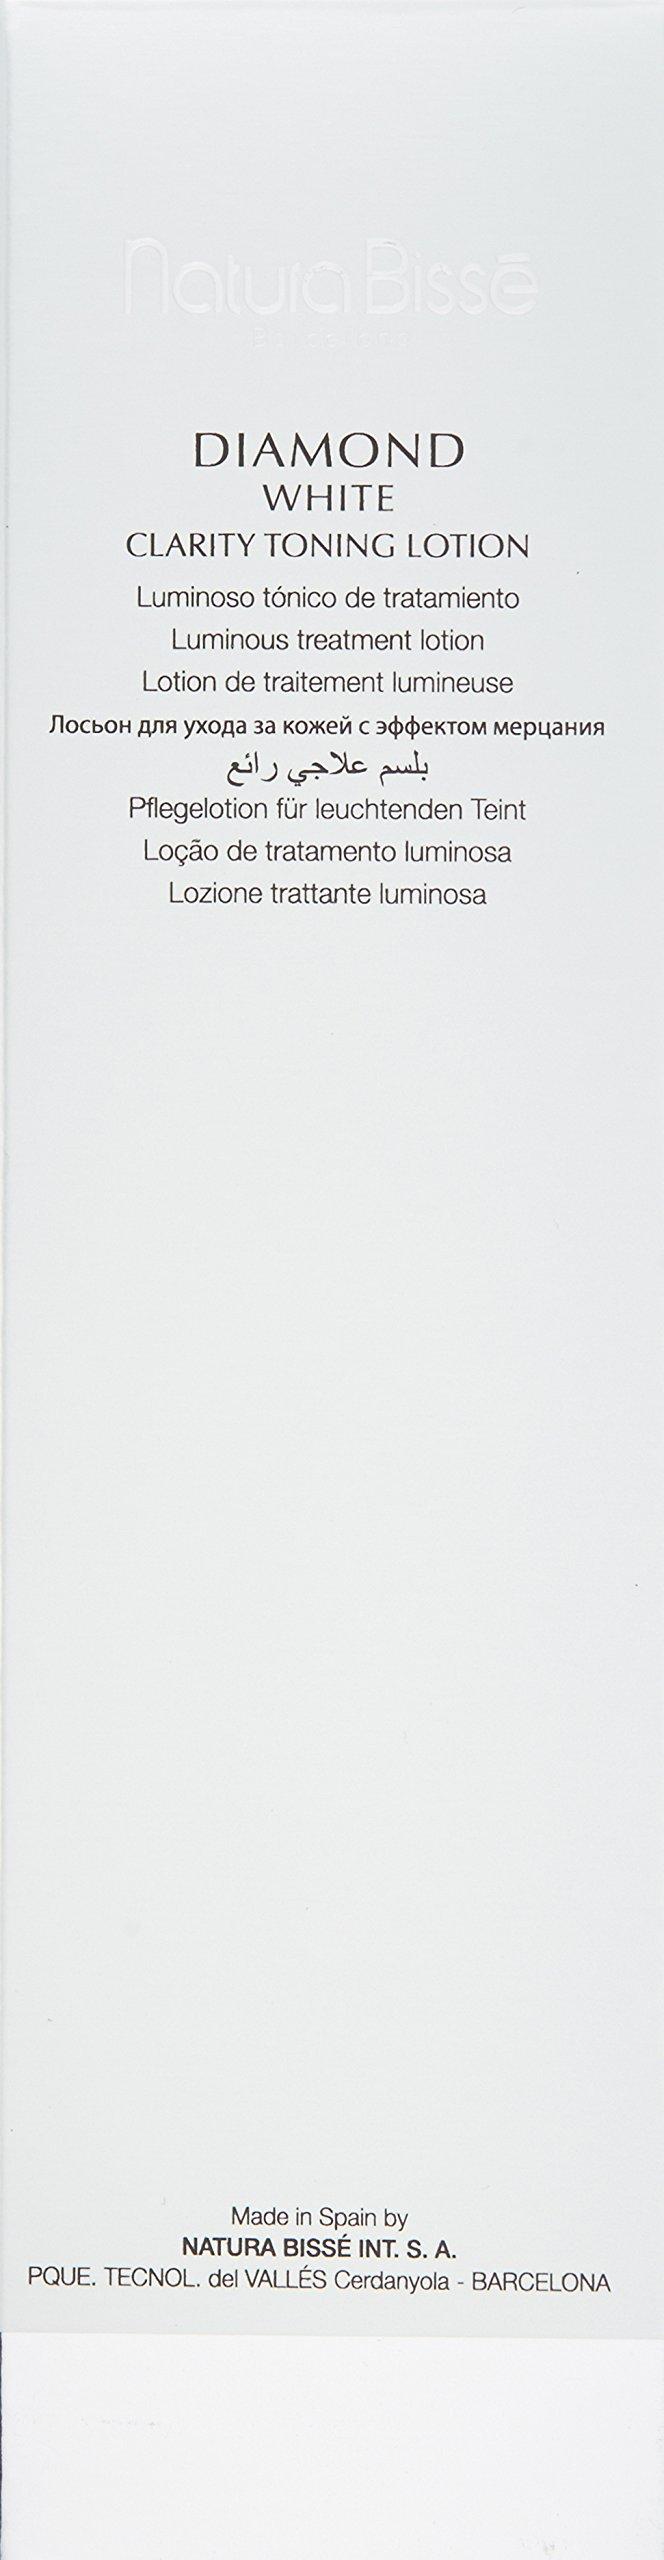 Natura Bisse Diamond White Clarity Toning Lotion, 7.0 fl. oz. by Natura Bisse (Image #2)